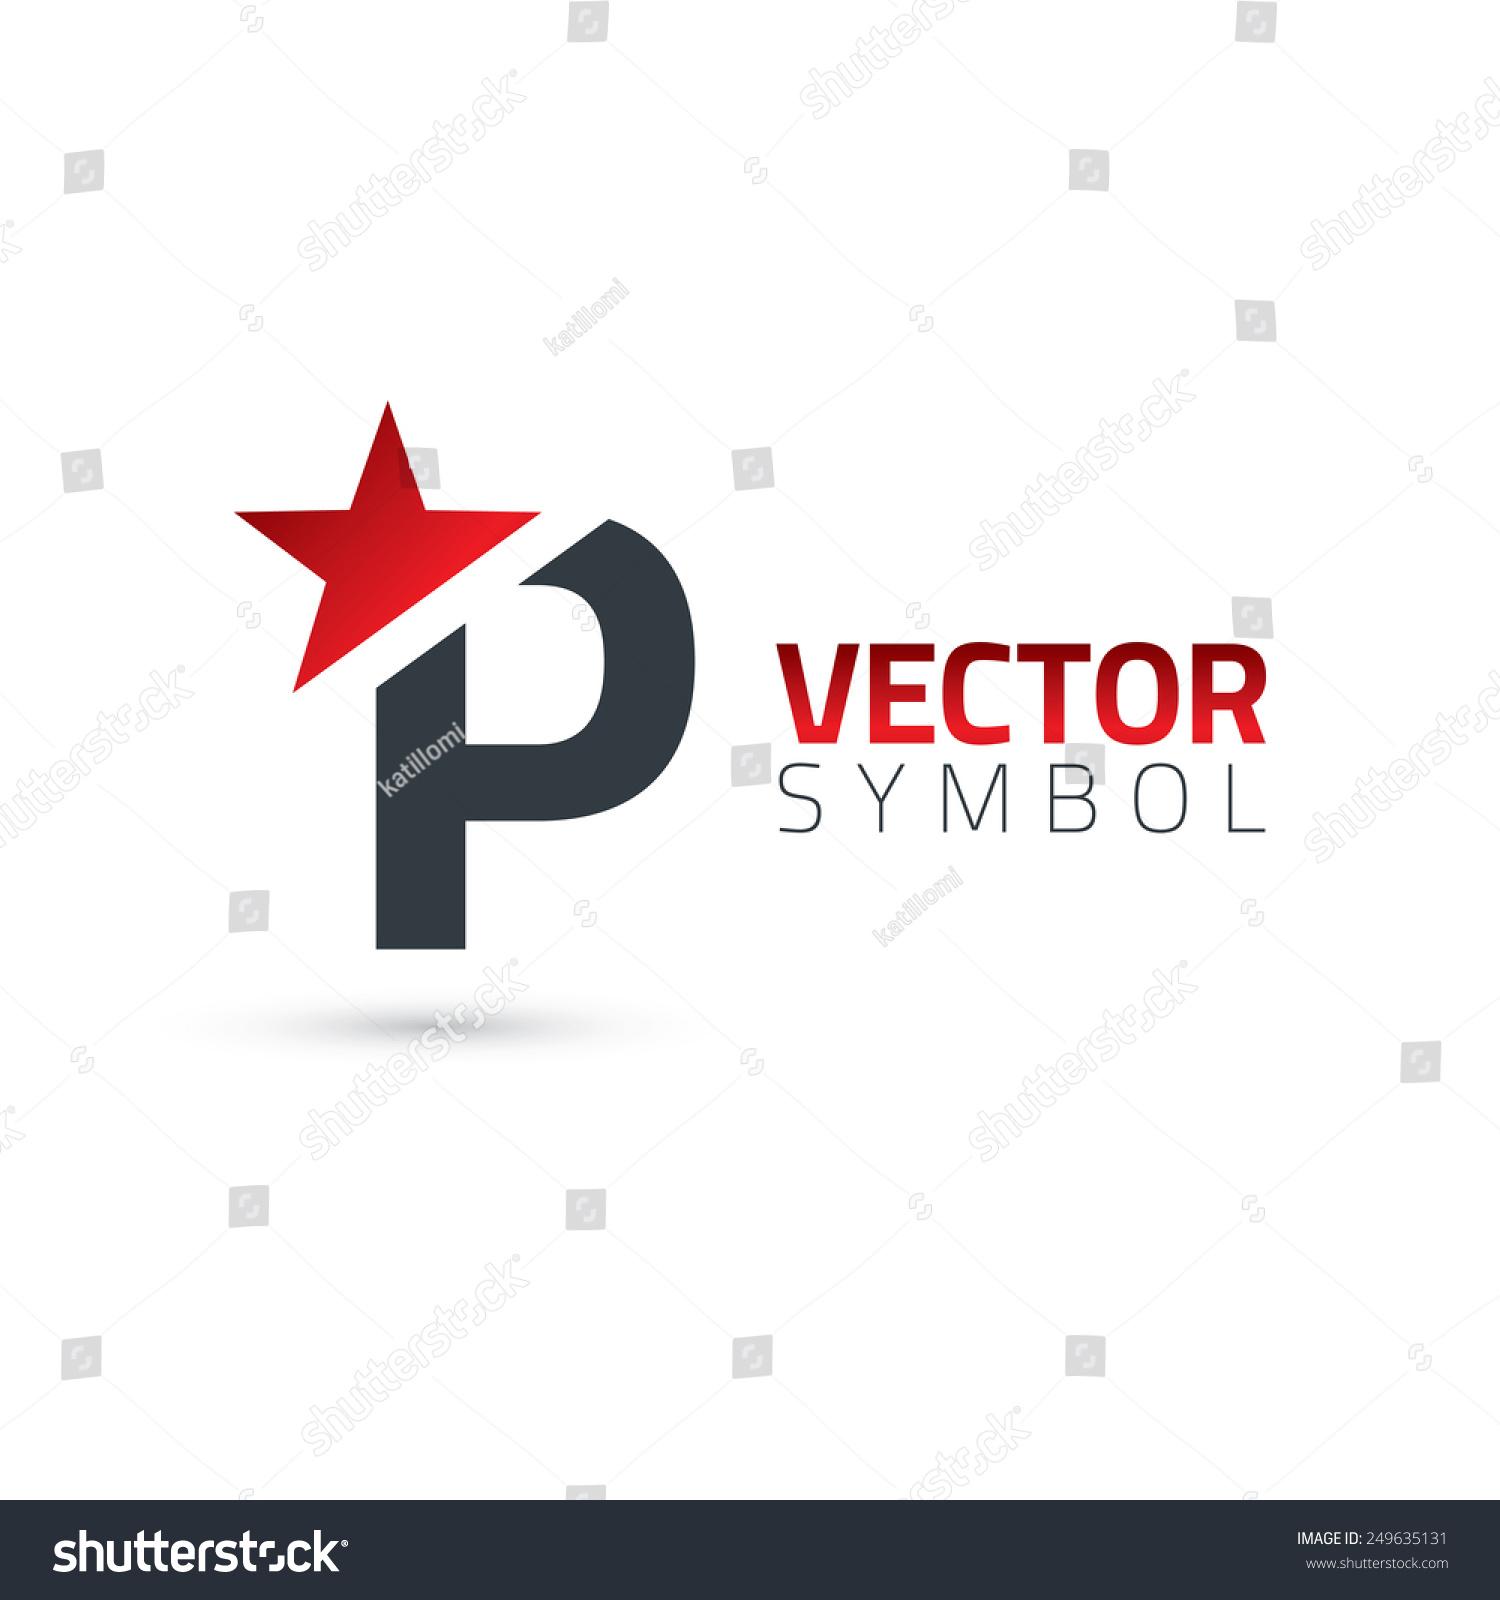 Vector graphic elegant sliced alphabet symbol stock vector vector graphic elegant sliced alphabet symbol with star element on top letter p biocorpaavc